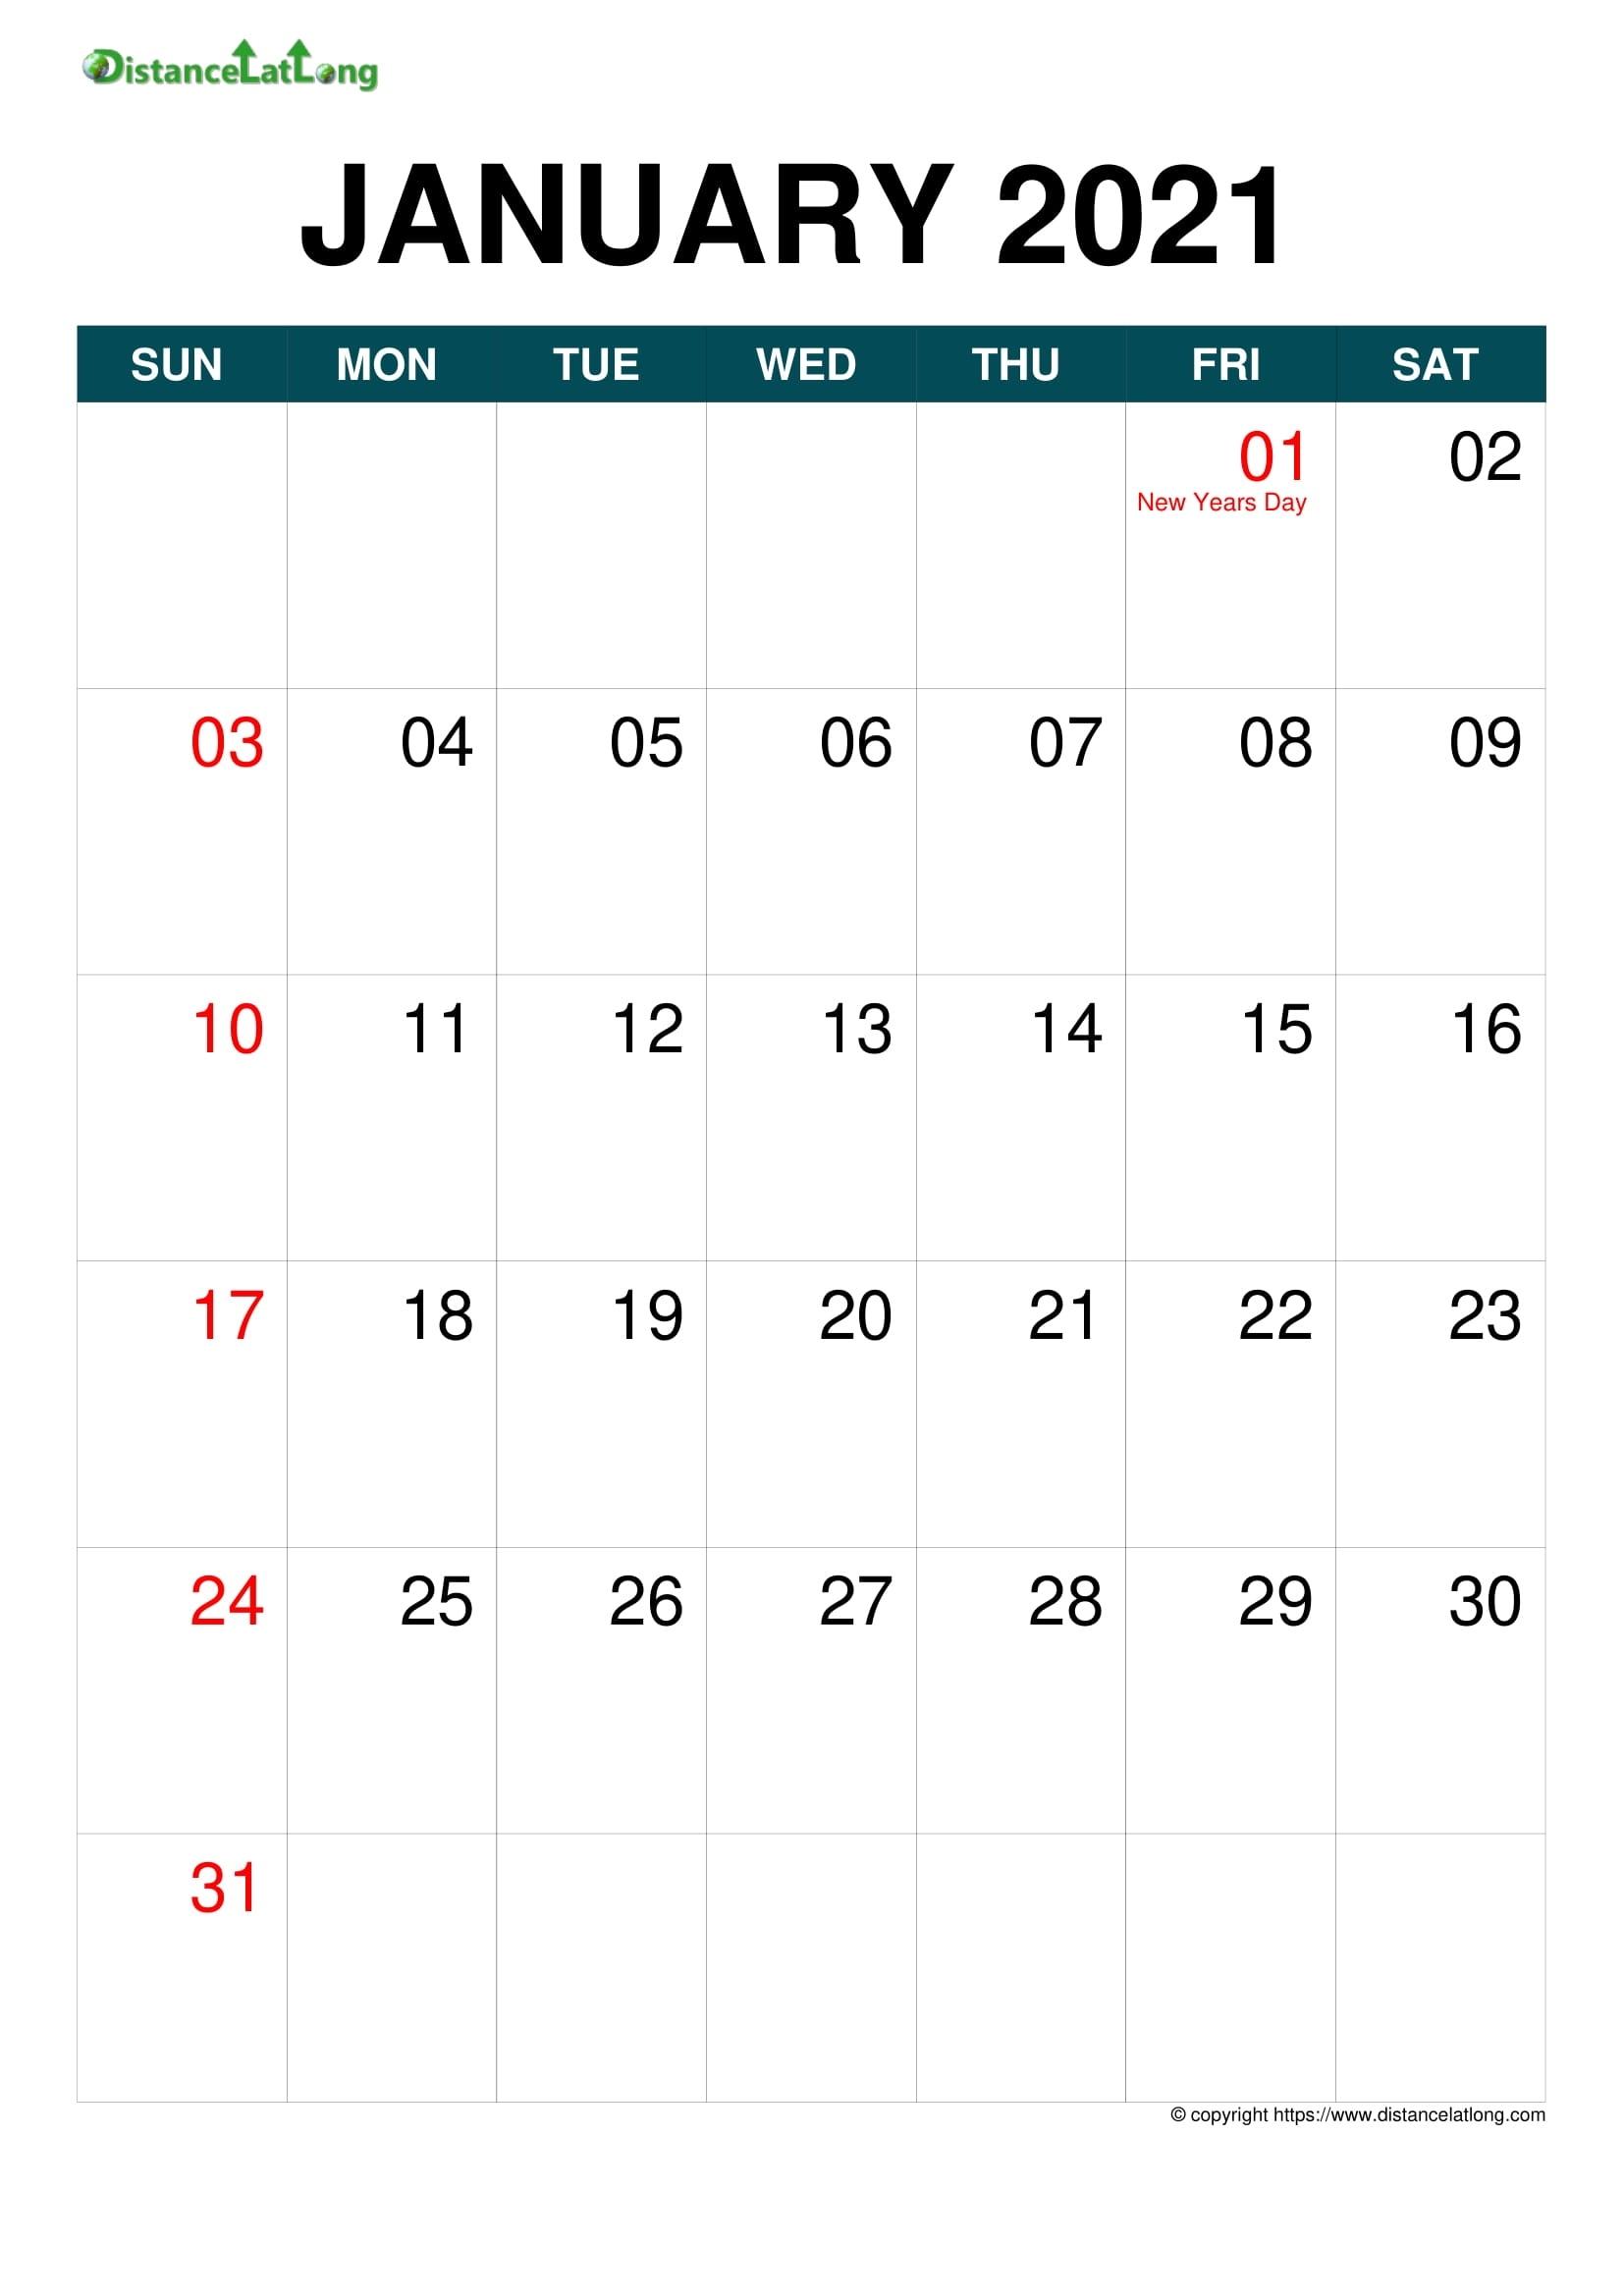 Free Printable 2021 Calendar With Jewish Holidays | Free 2021 Printable Calendars July 2021 Calendar Portrait